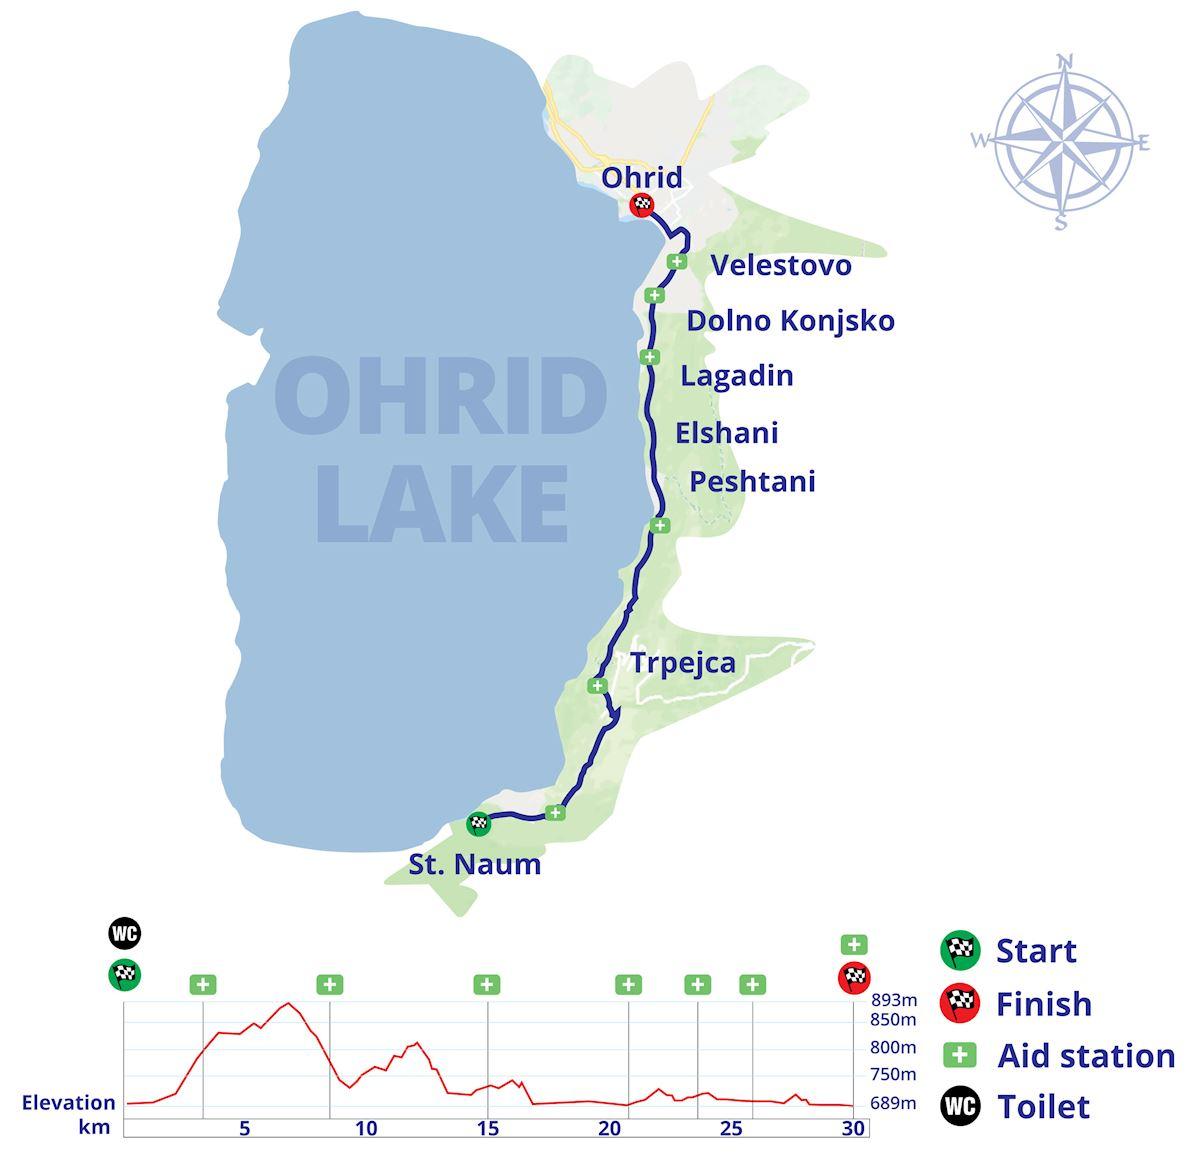 International Athletic Marathon Ohrid 路线图